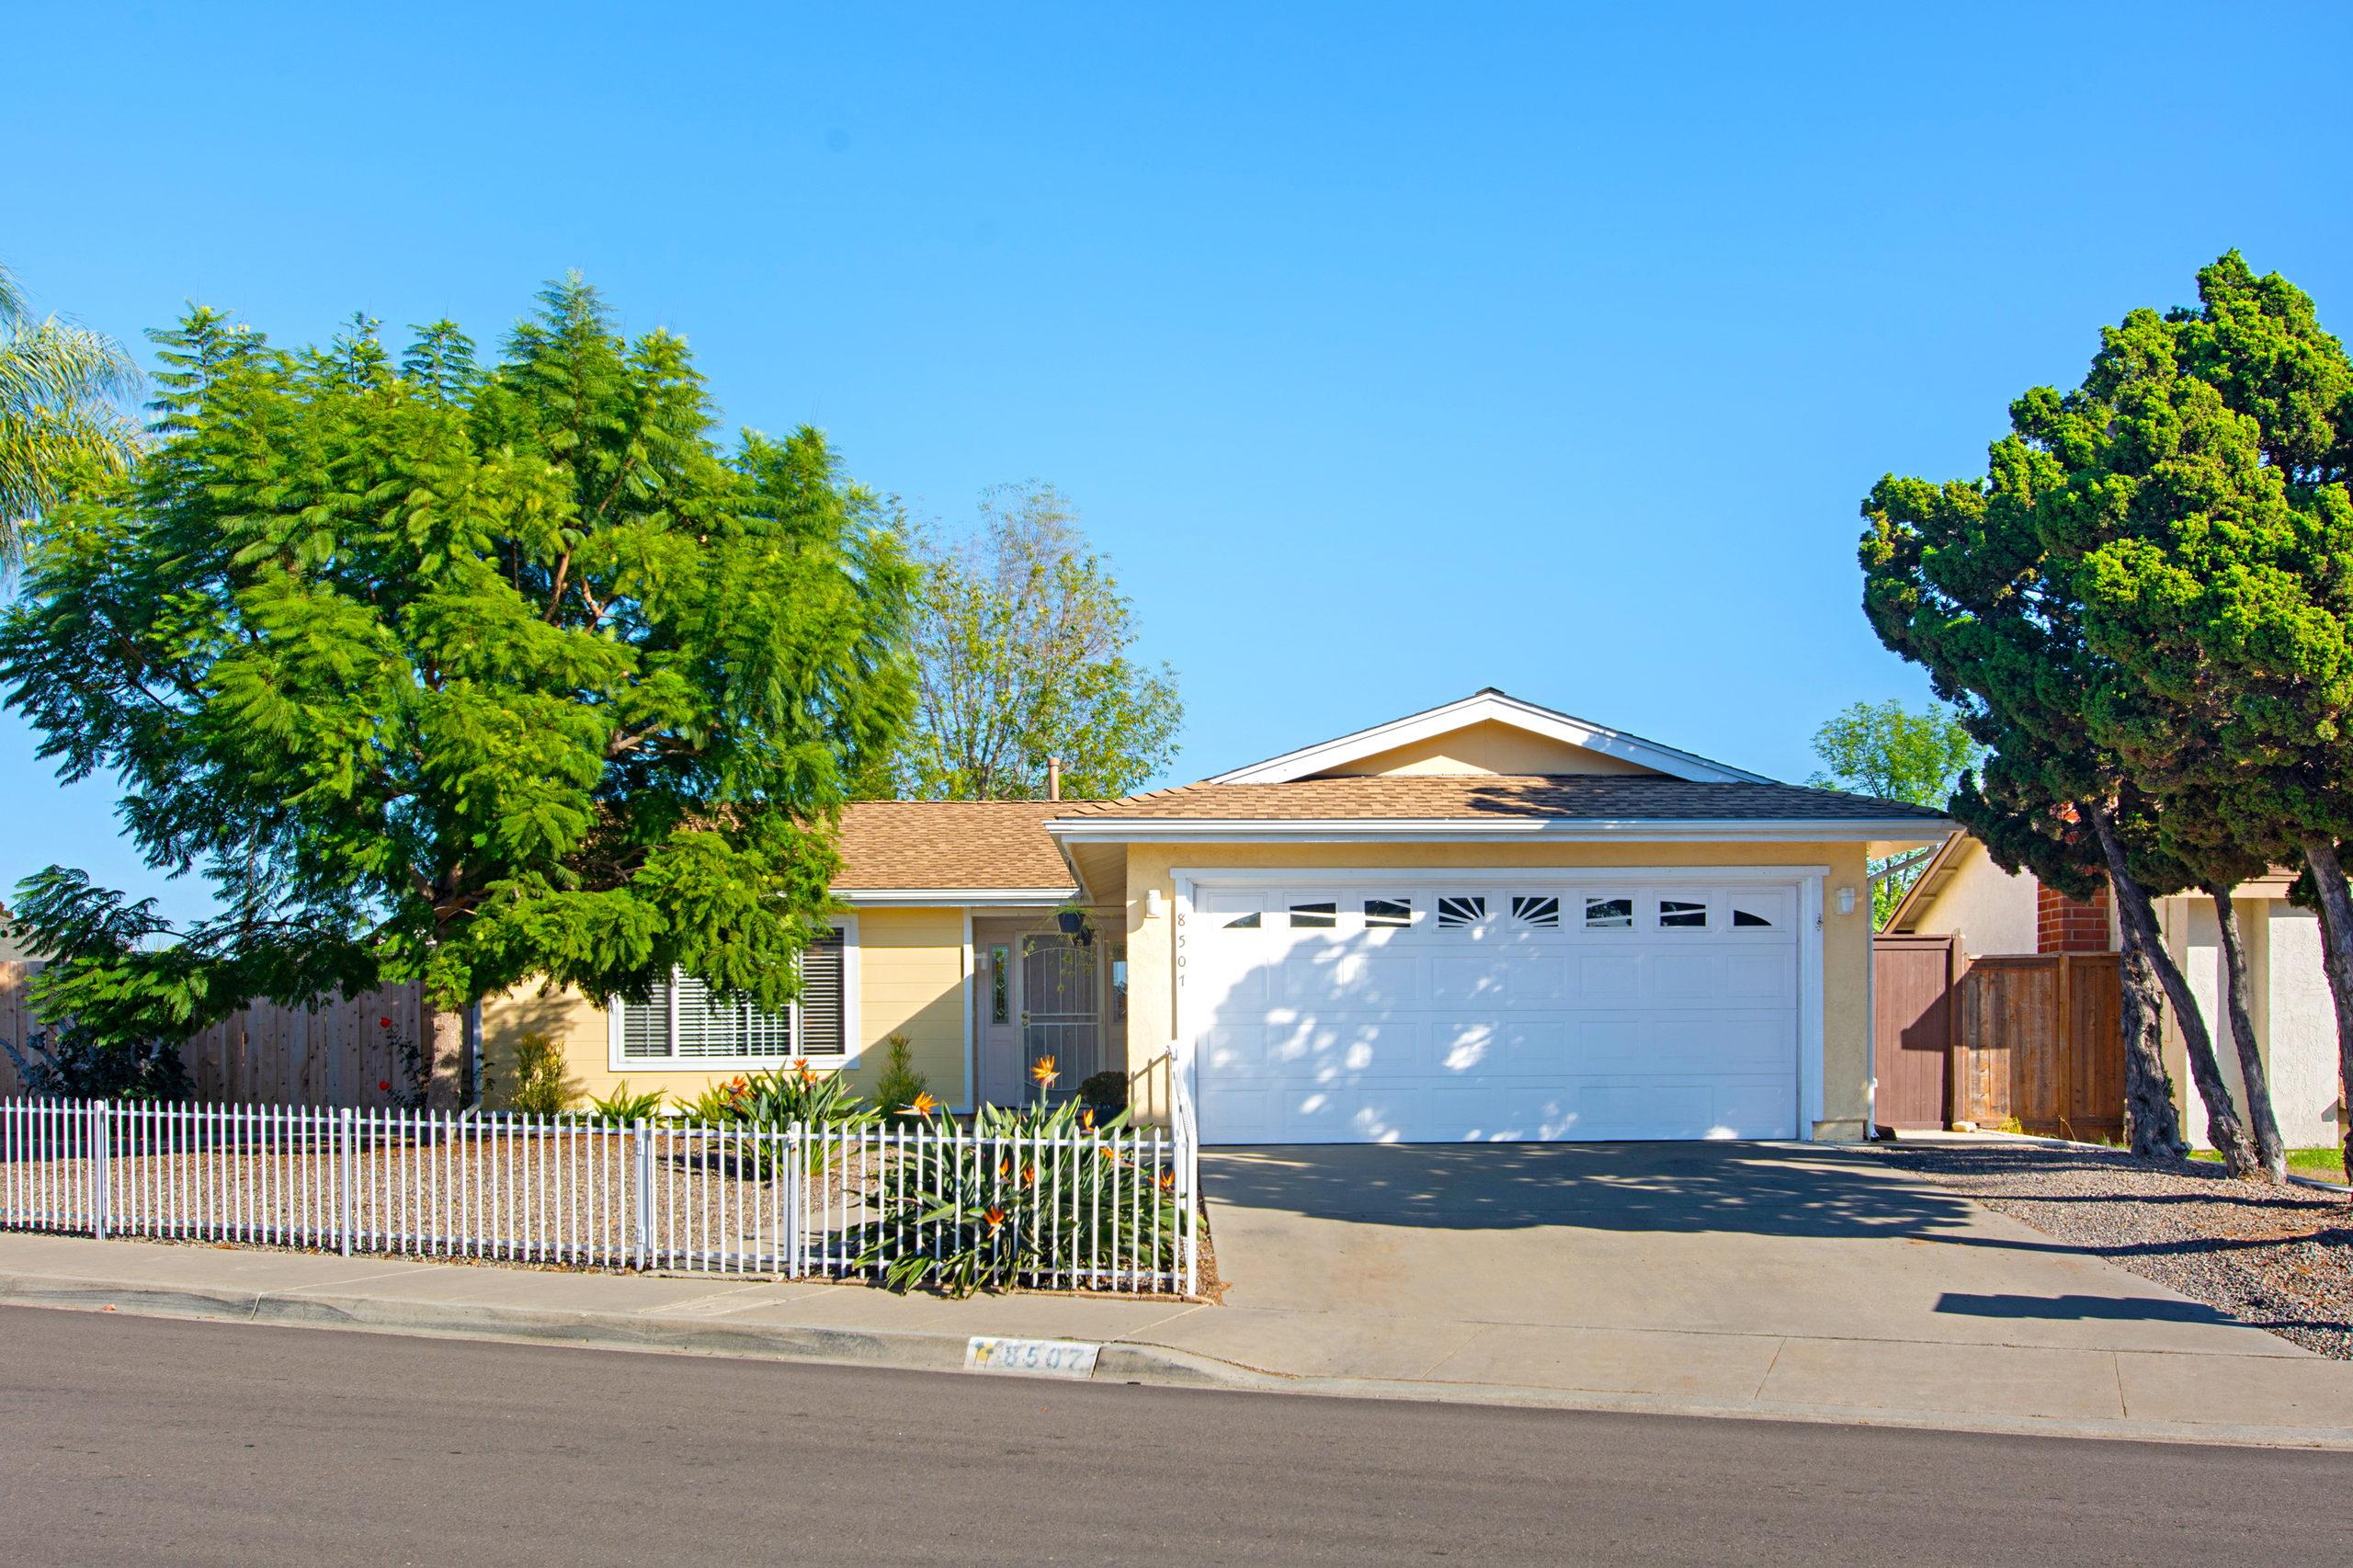 8507 Menkar Road, San Diego, CA 92128